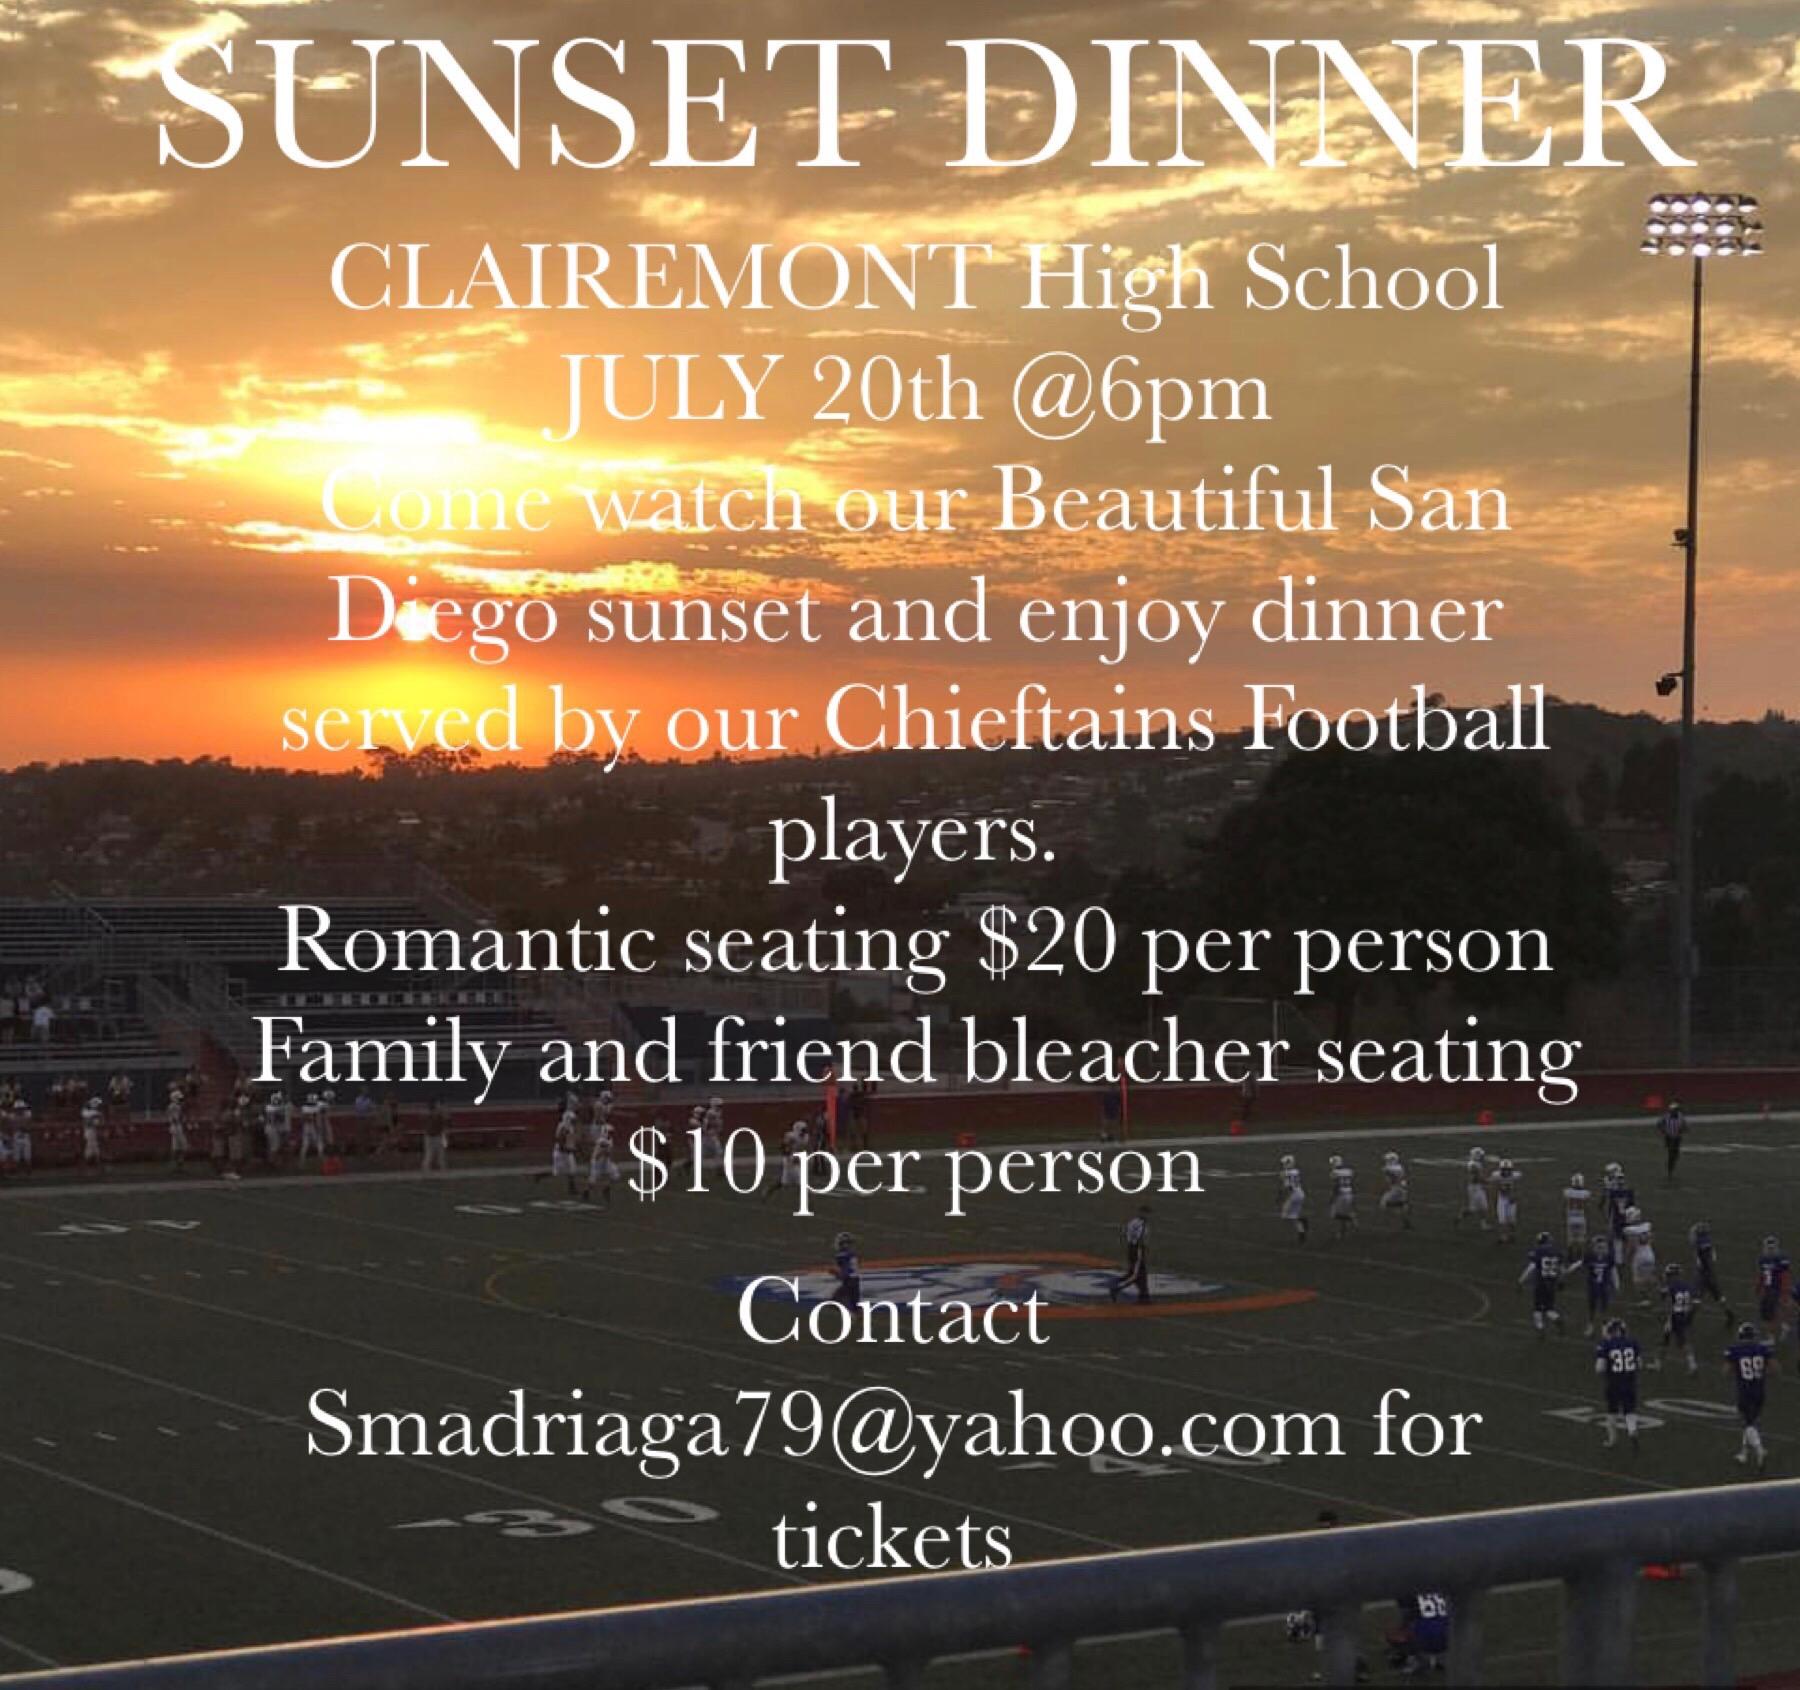 Football Sunset Dinner Fundraiser – July 20th 6pm